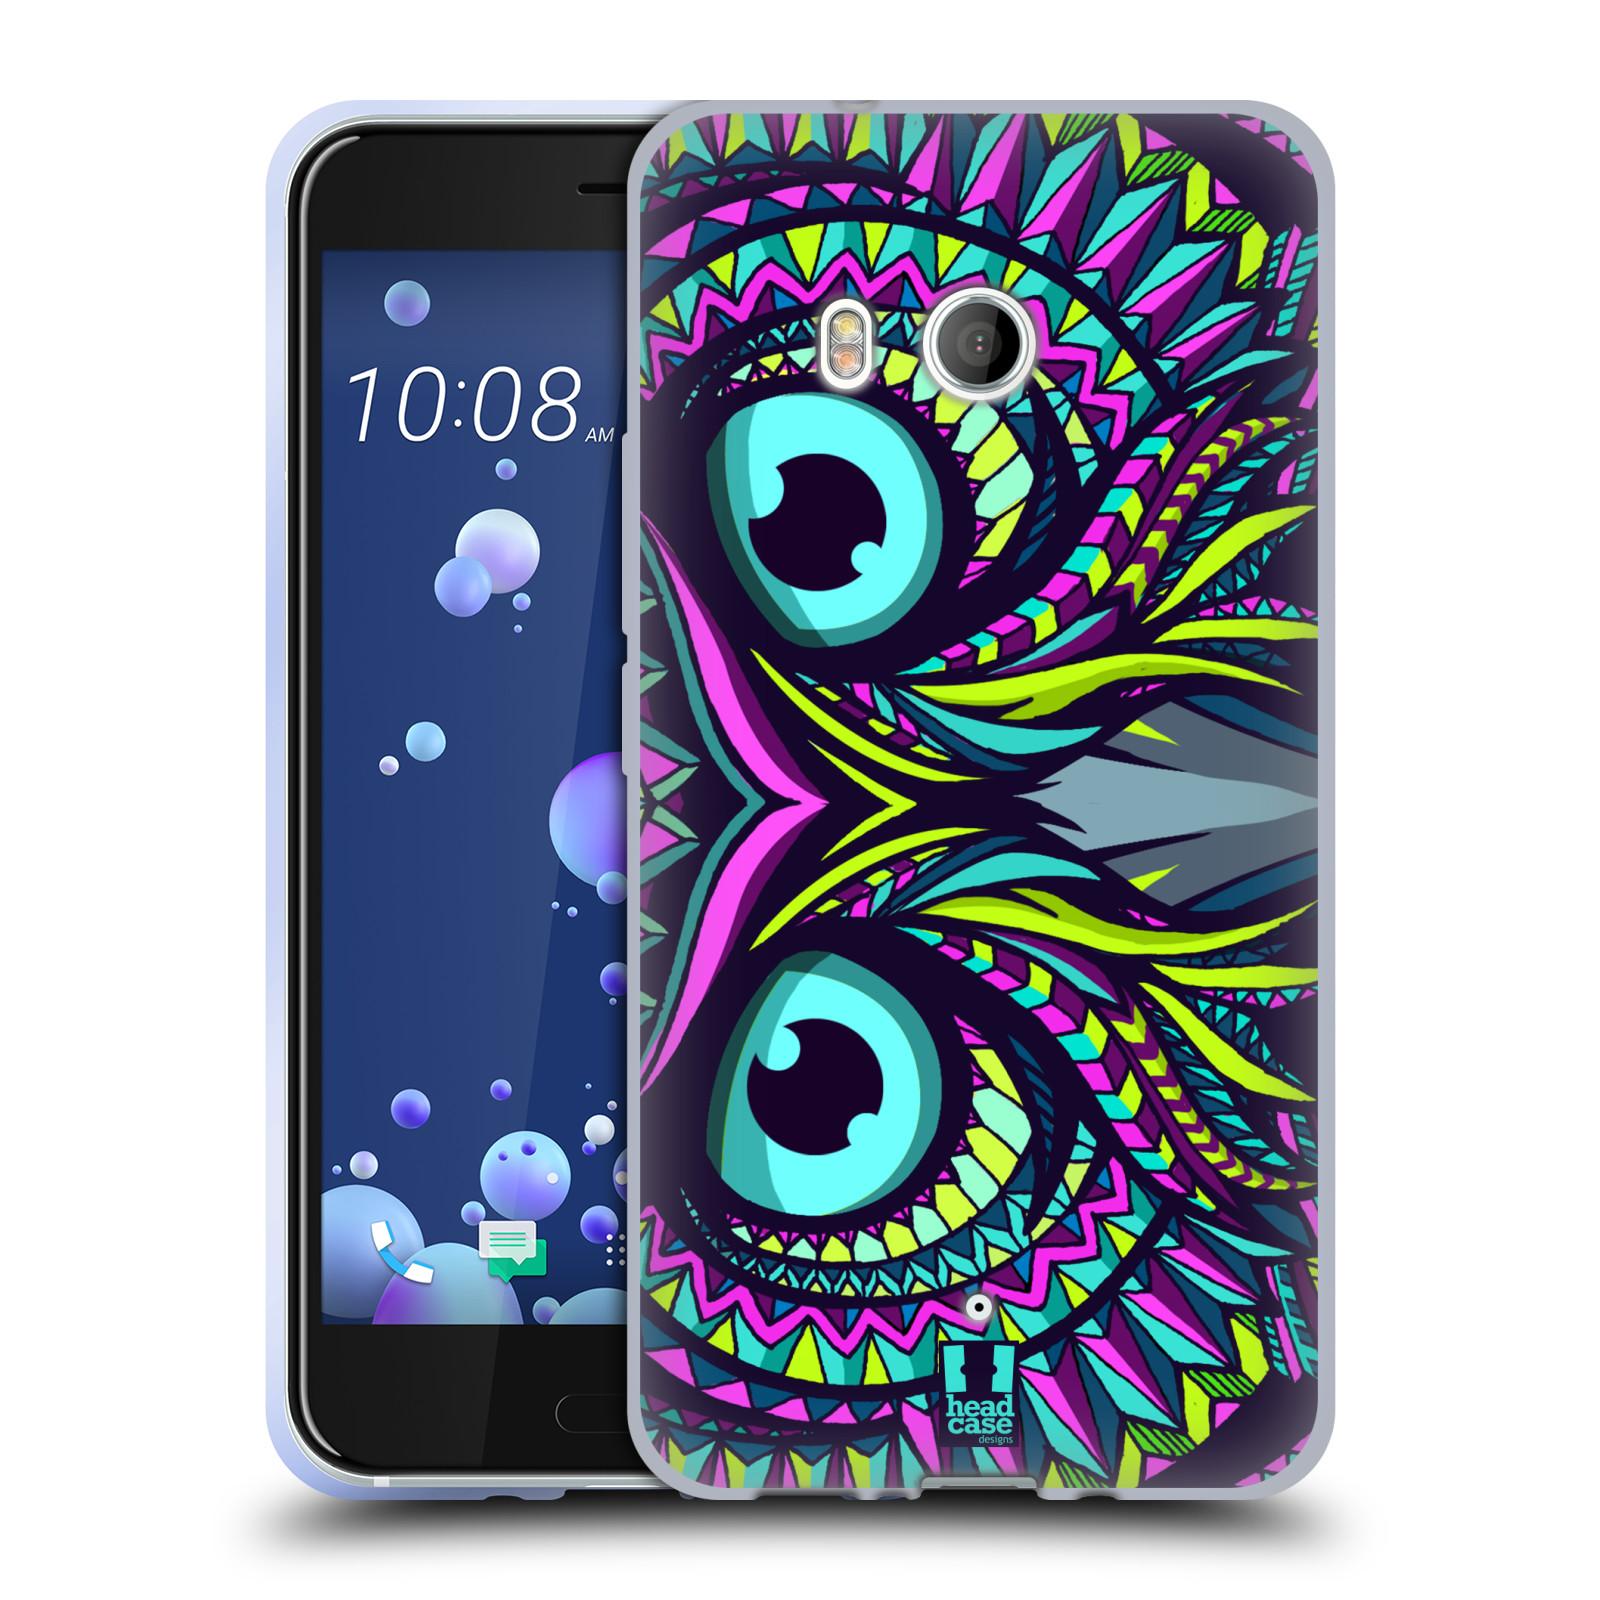 Silikonové pouzdro na mobil HTC U11 - Head Case - AZTEC SOVA